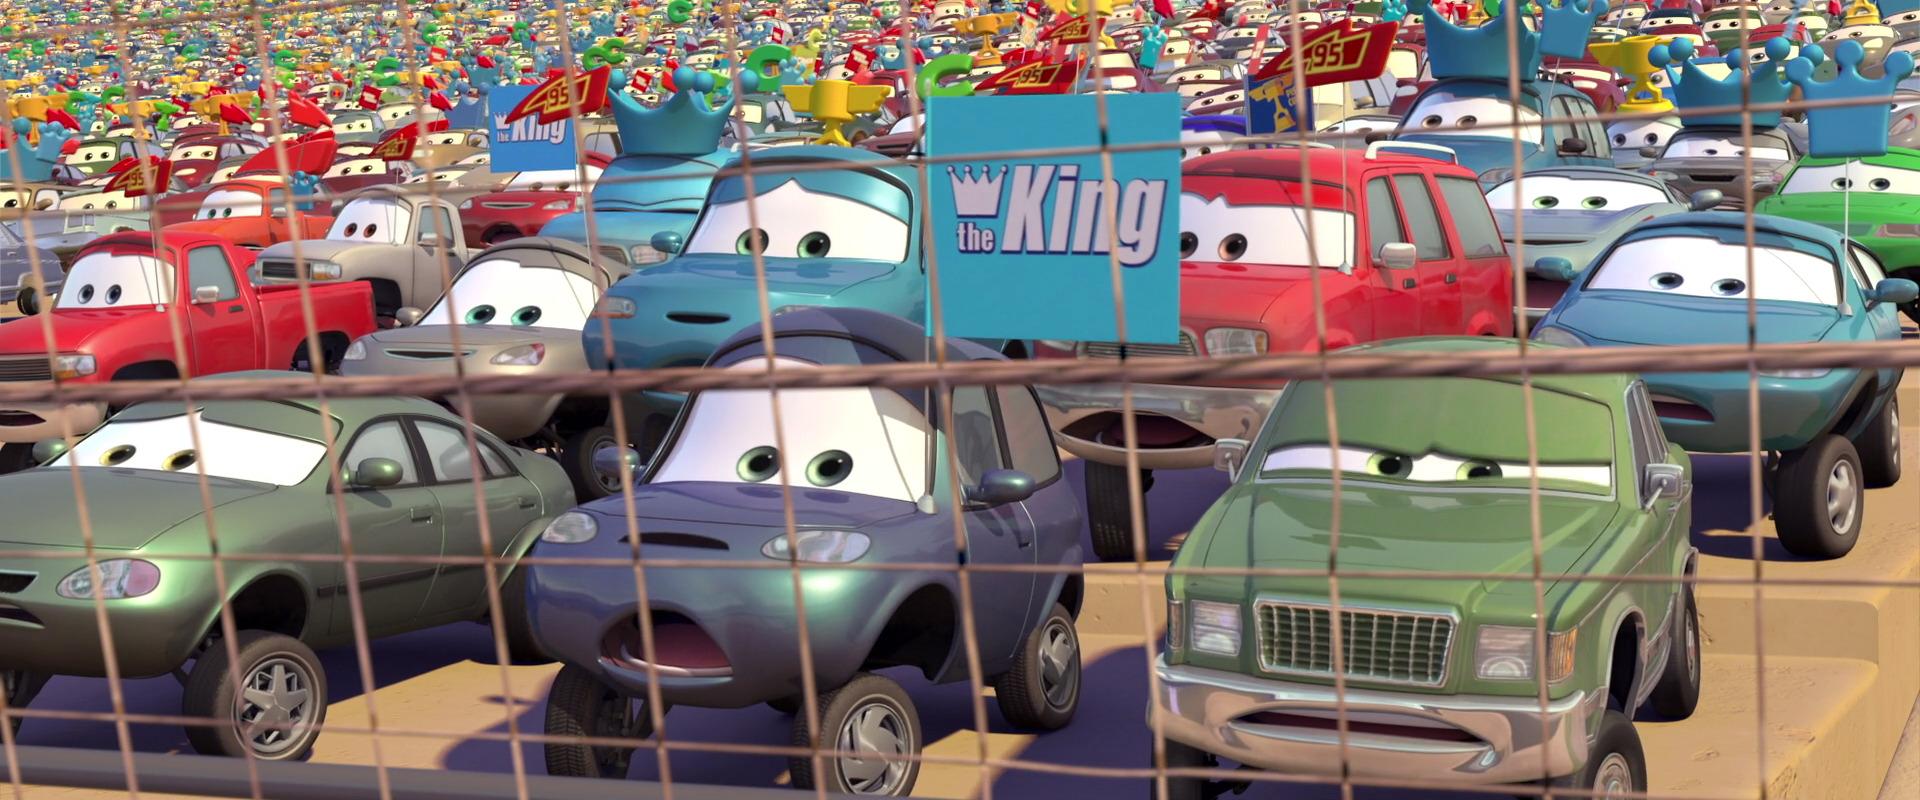 matthew-tout-bleu-mcCrew-personnage-cars-01